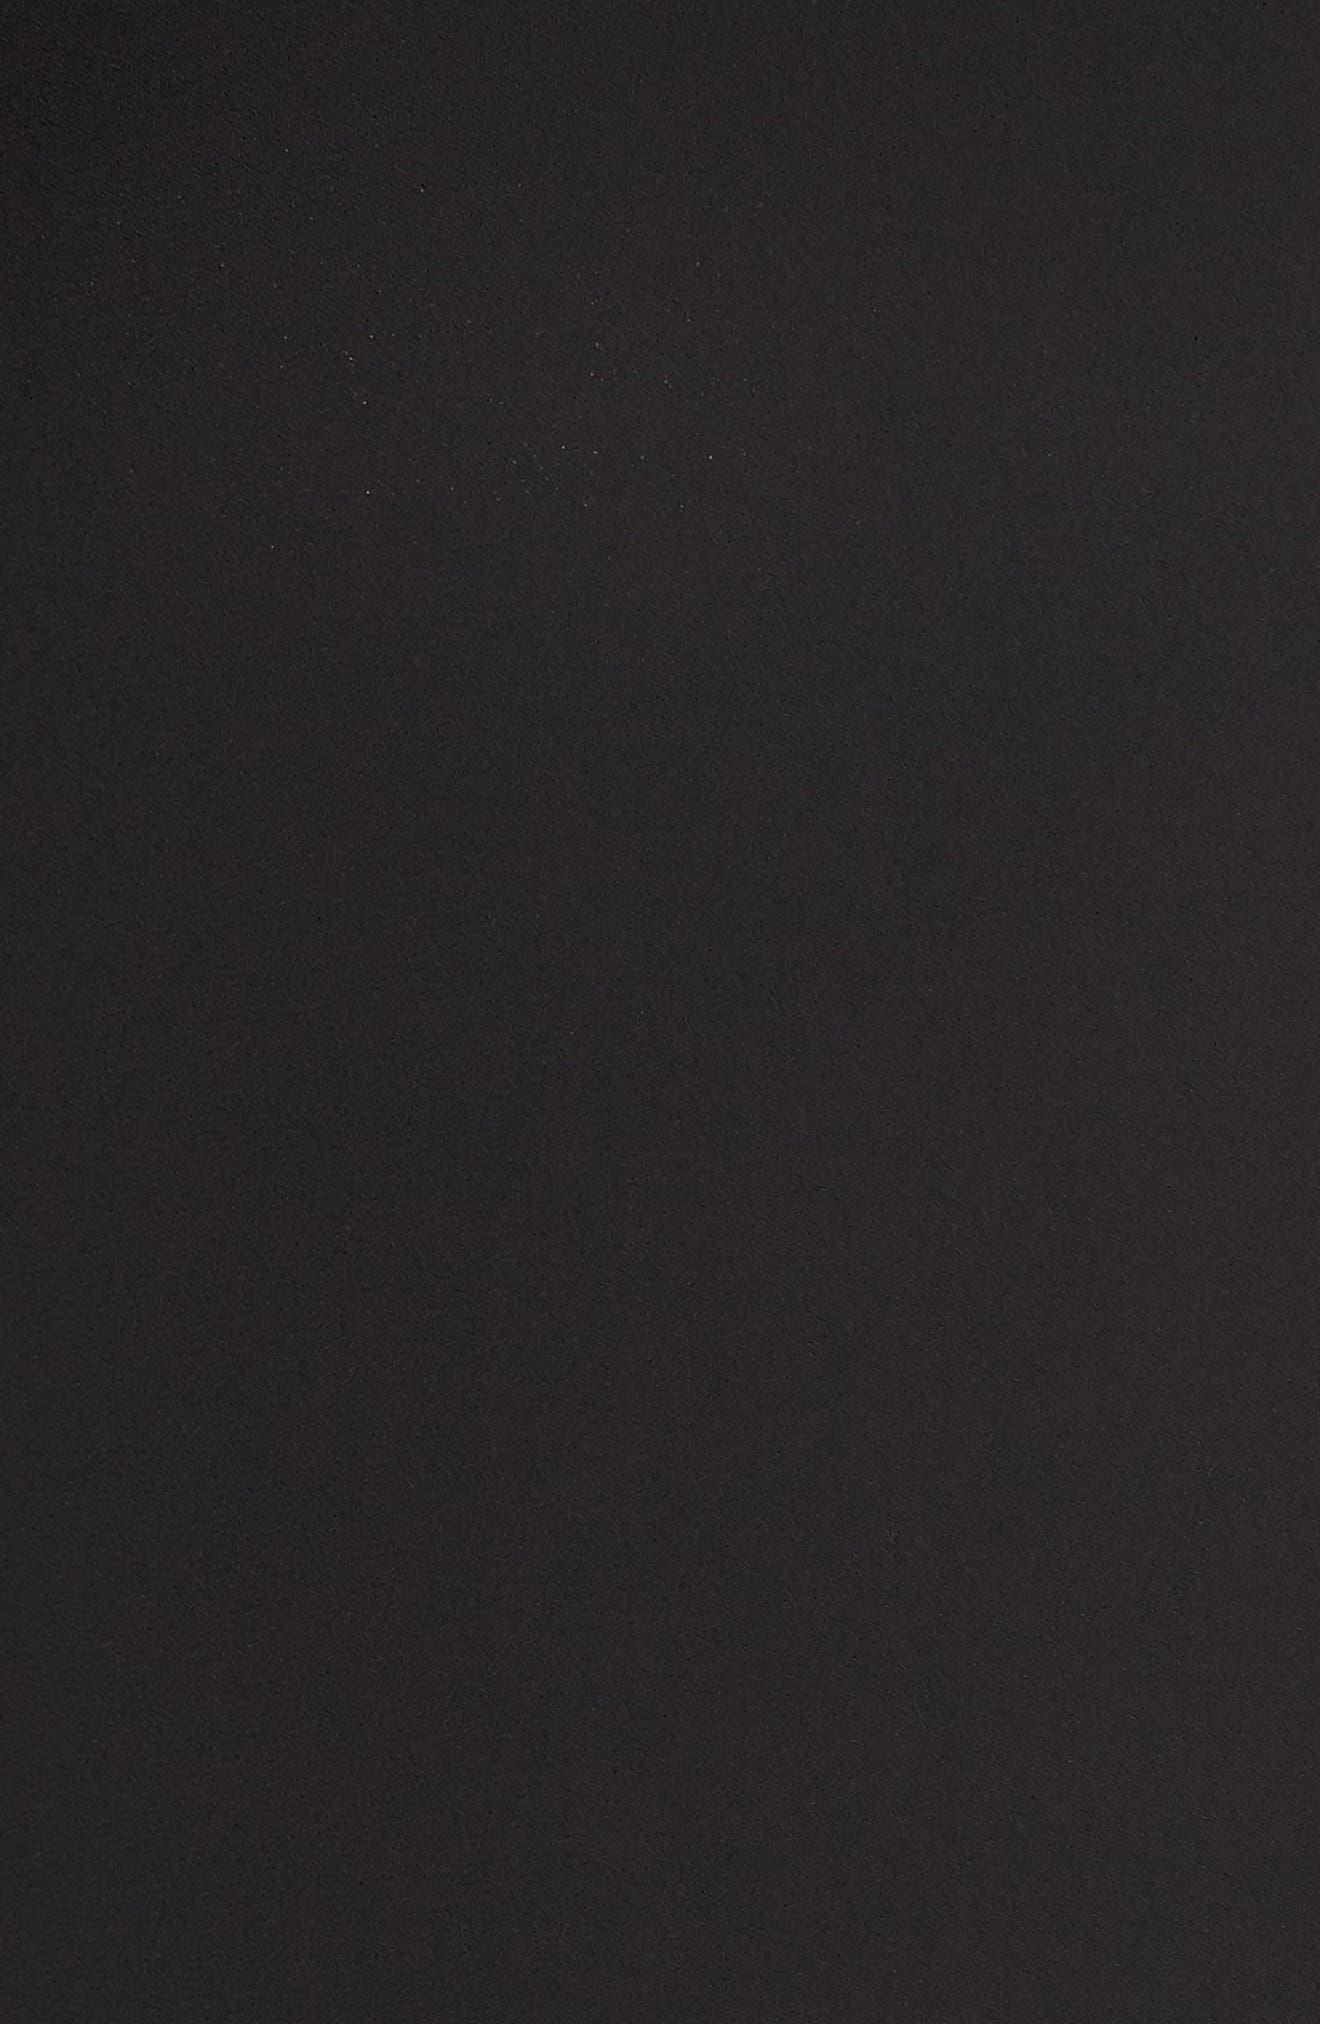 Button Sleeve Blouse,                             Alternate thumbnail 5, color,                             001